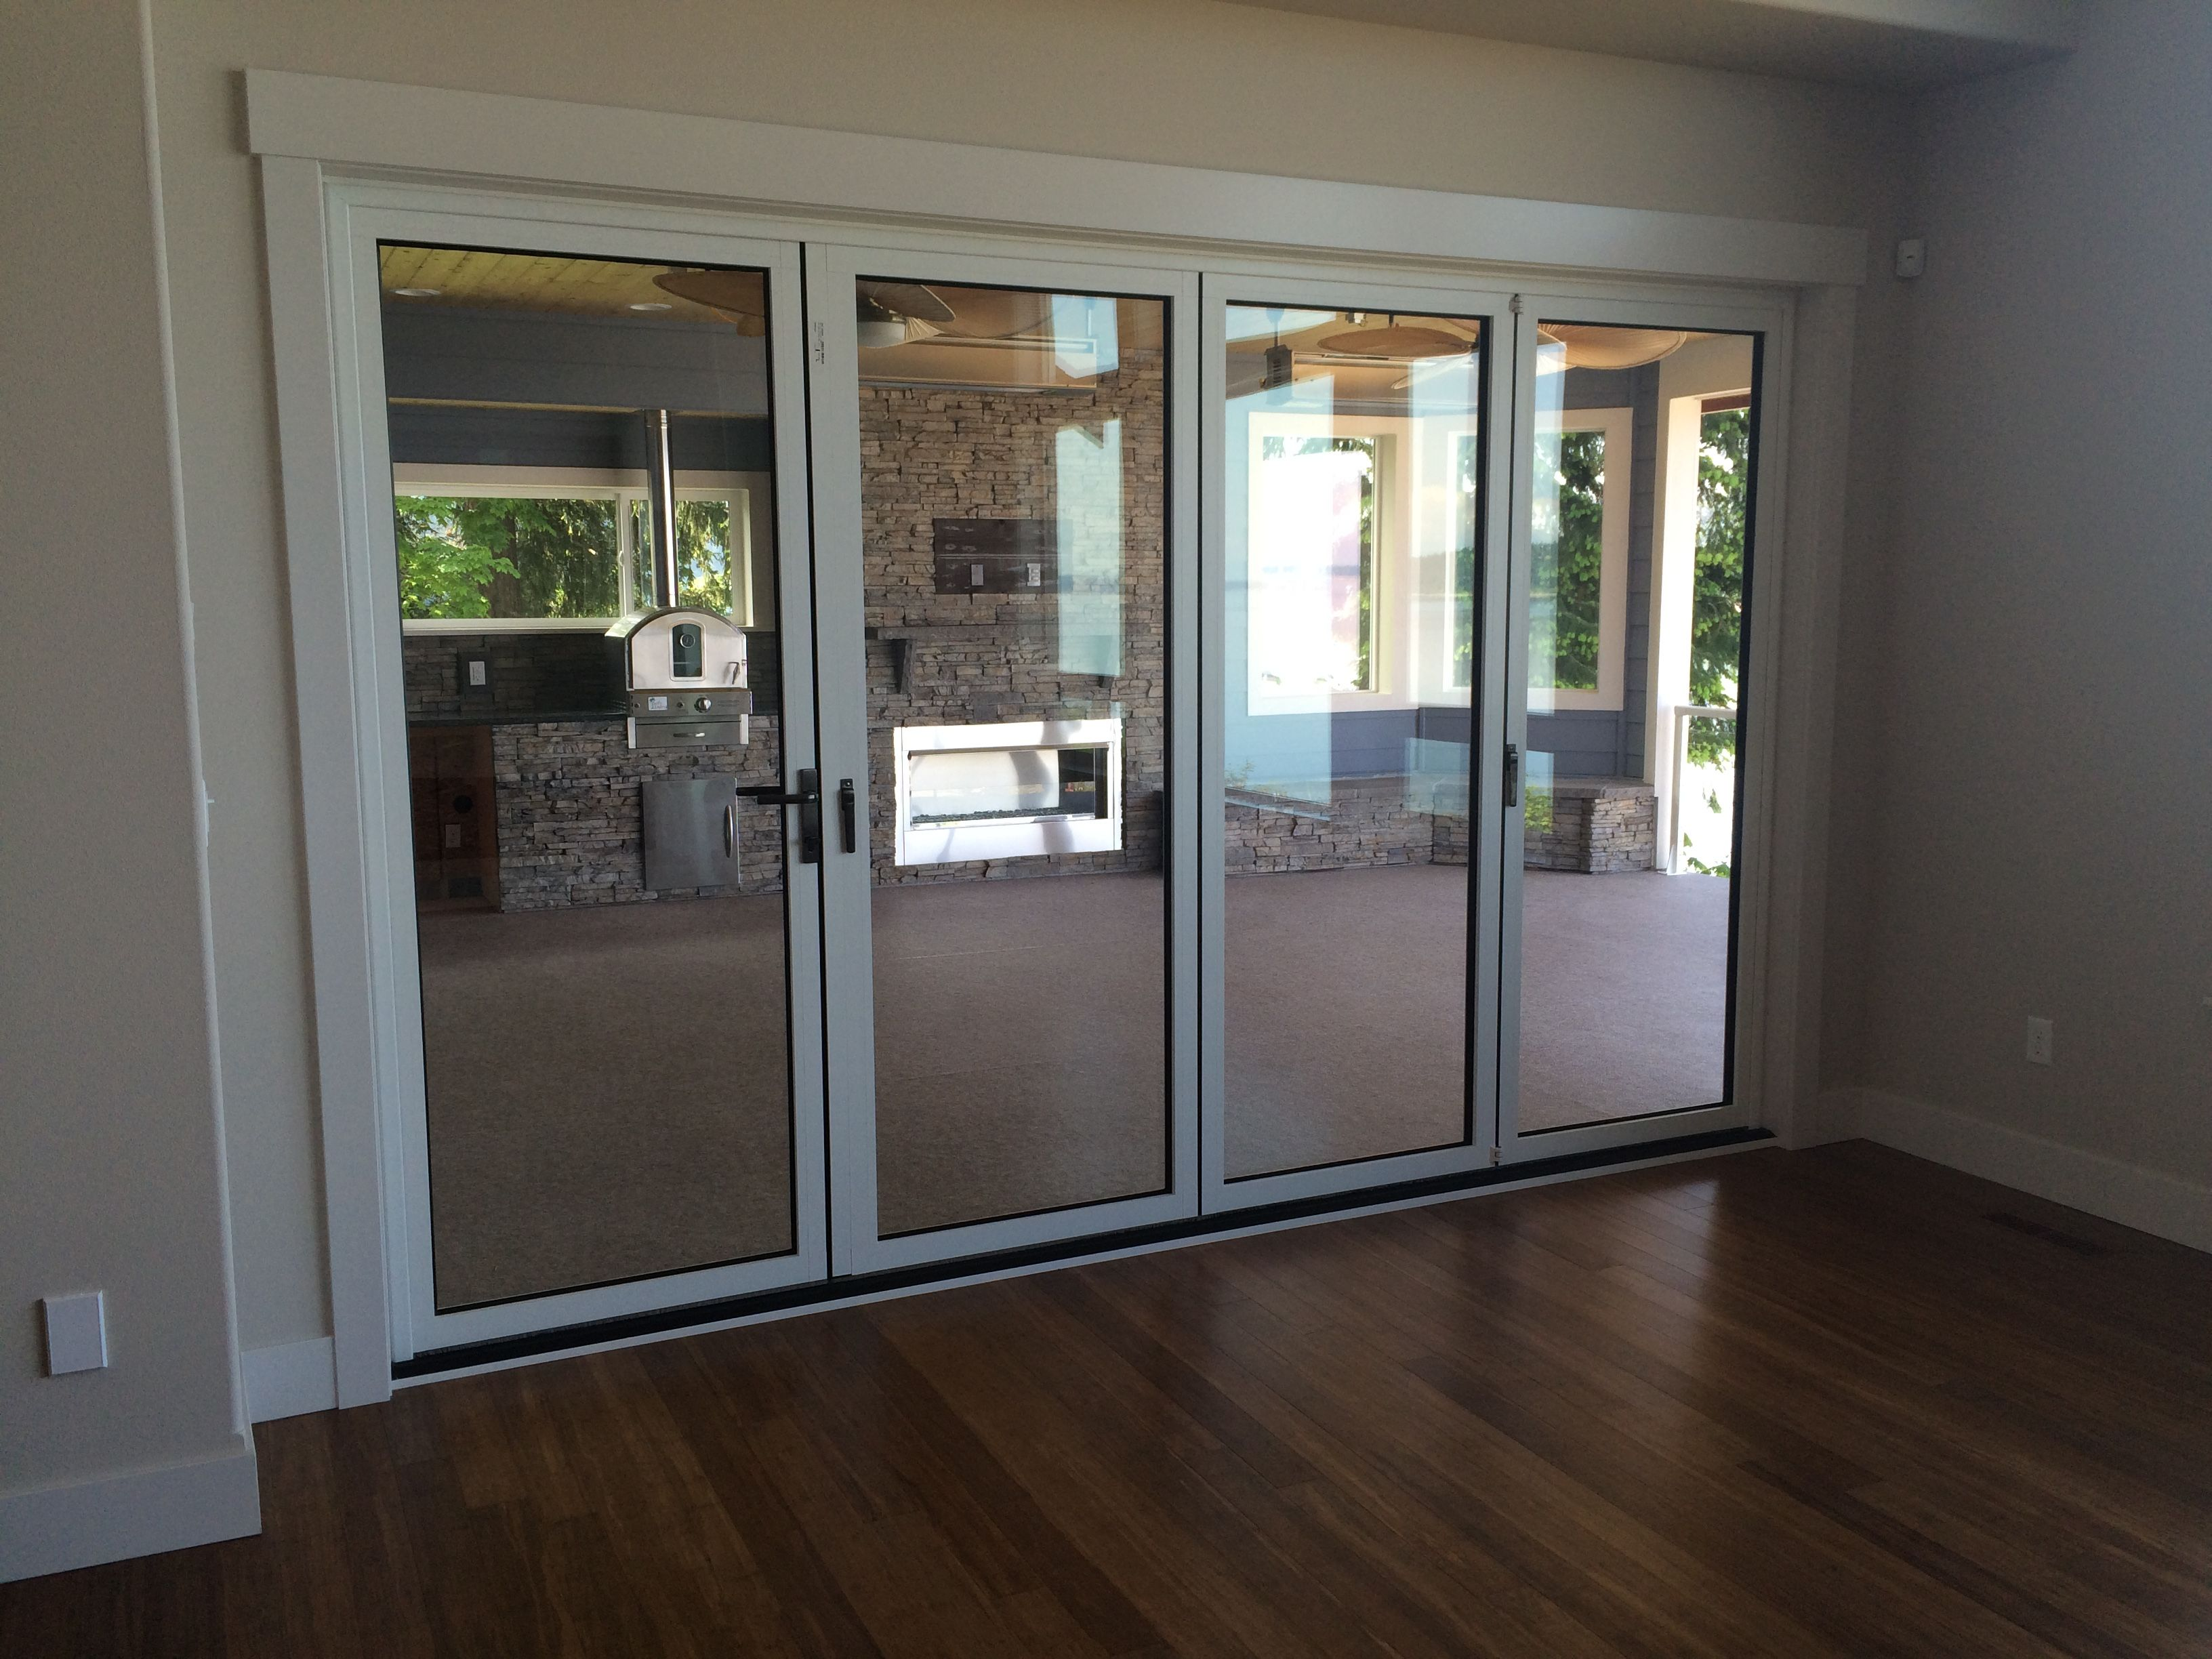 nano door - shown closed | patios + landscape |gnw | pinterest